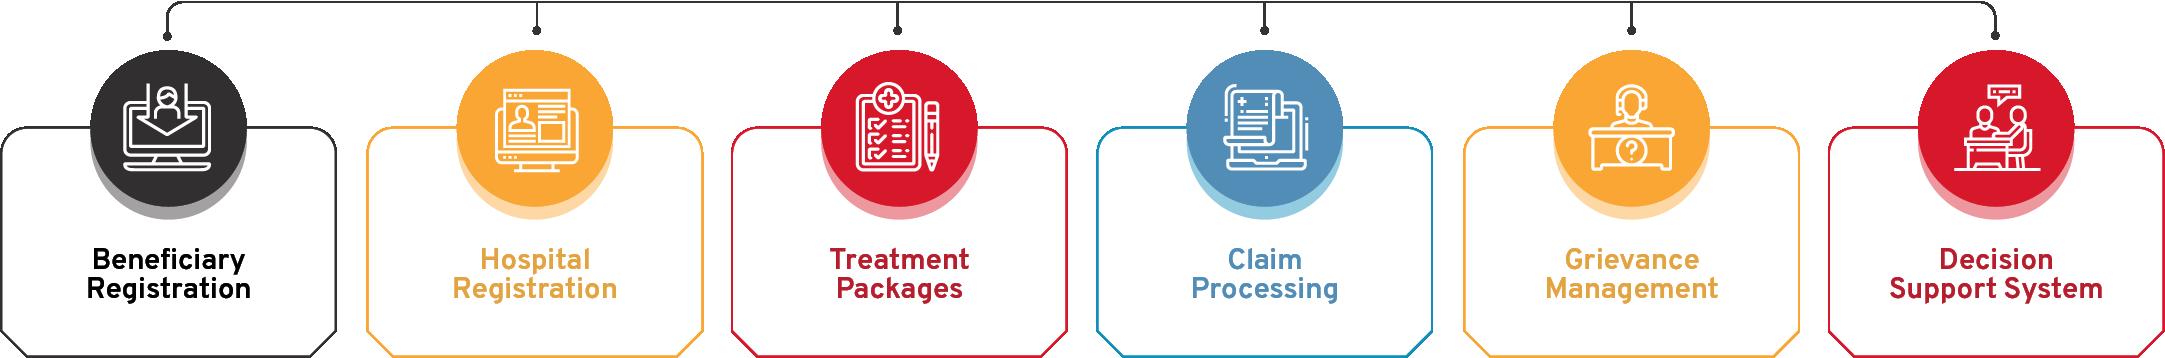 Healthcare Scheme Monitoring System Flow Diagram - CSM Technologies